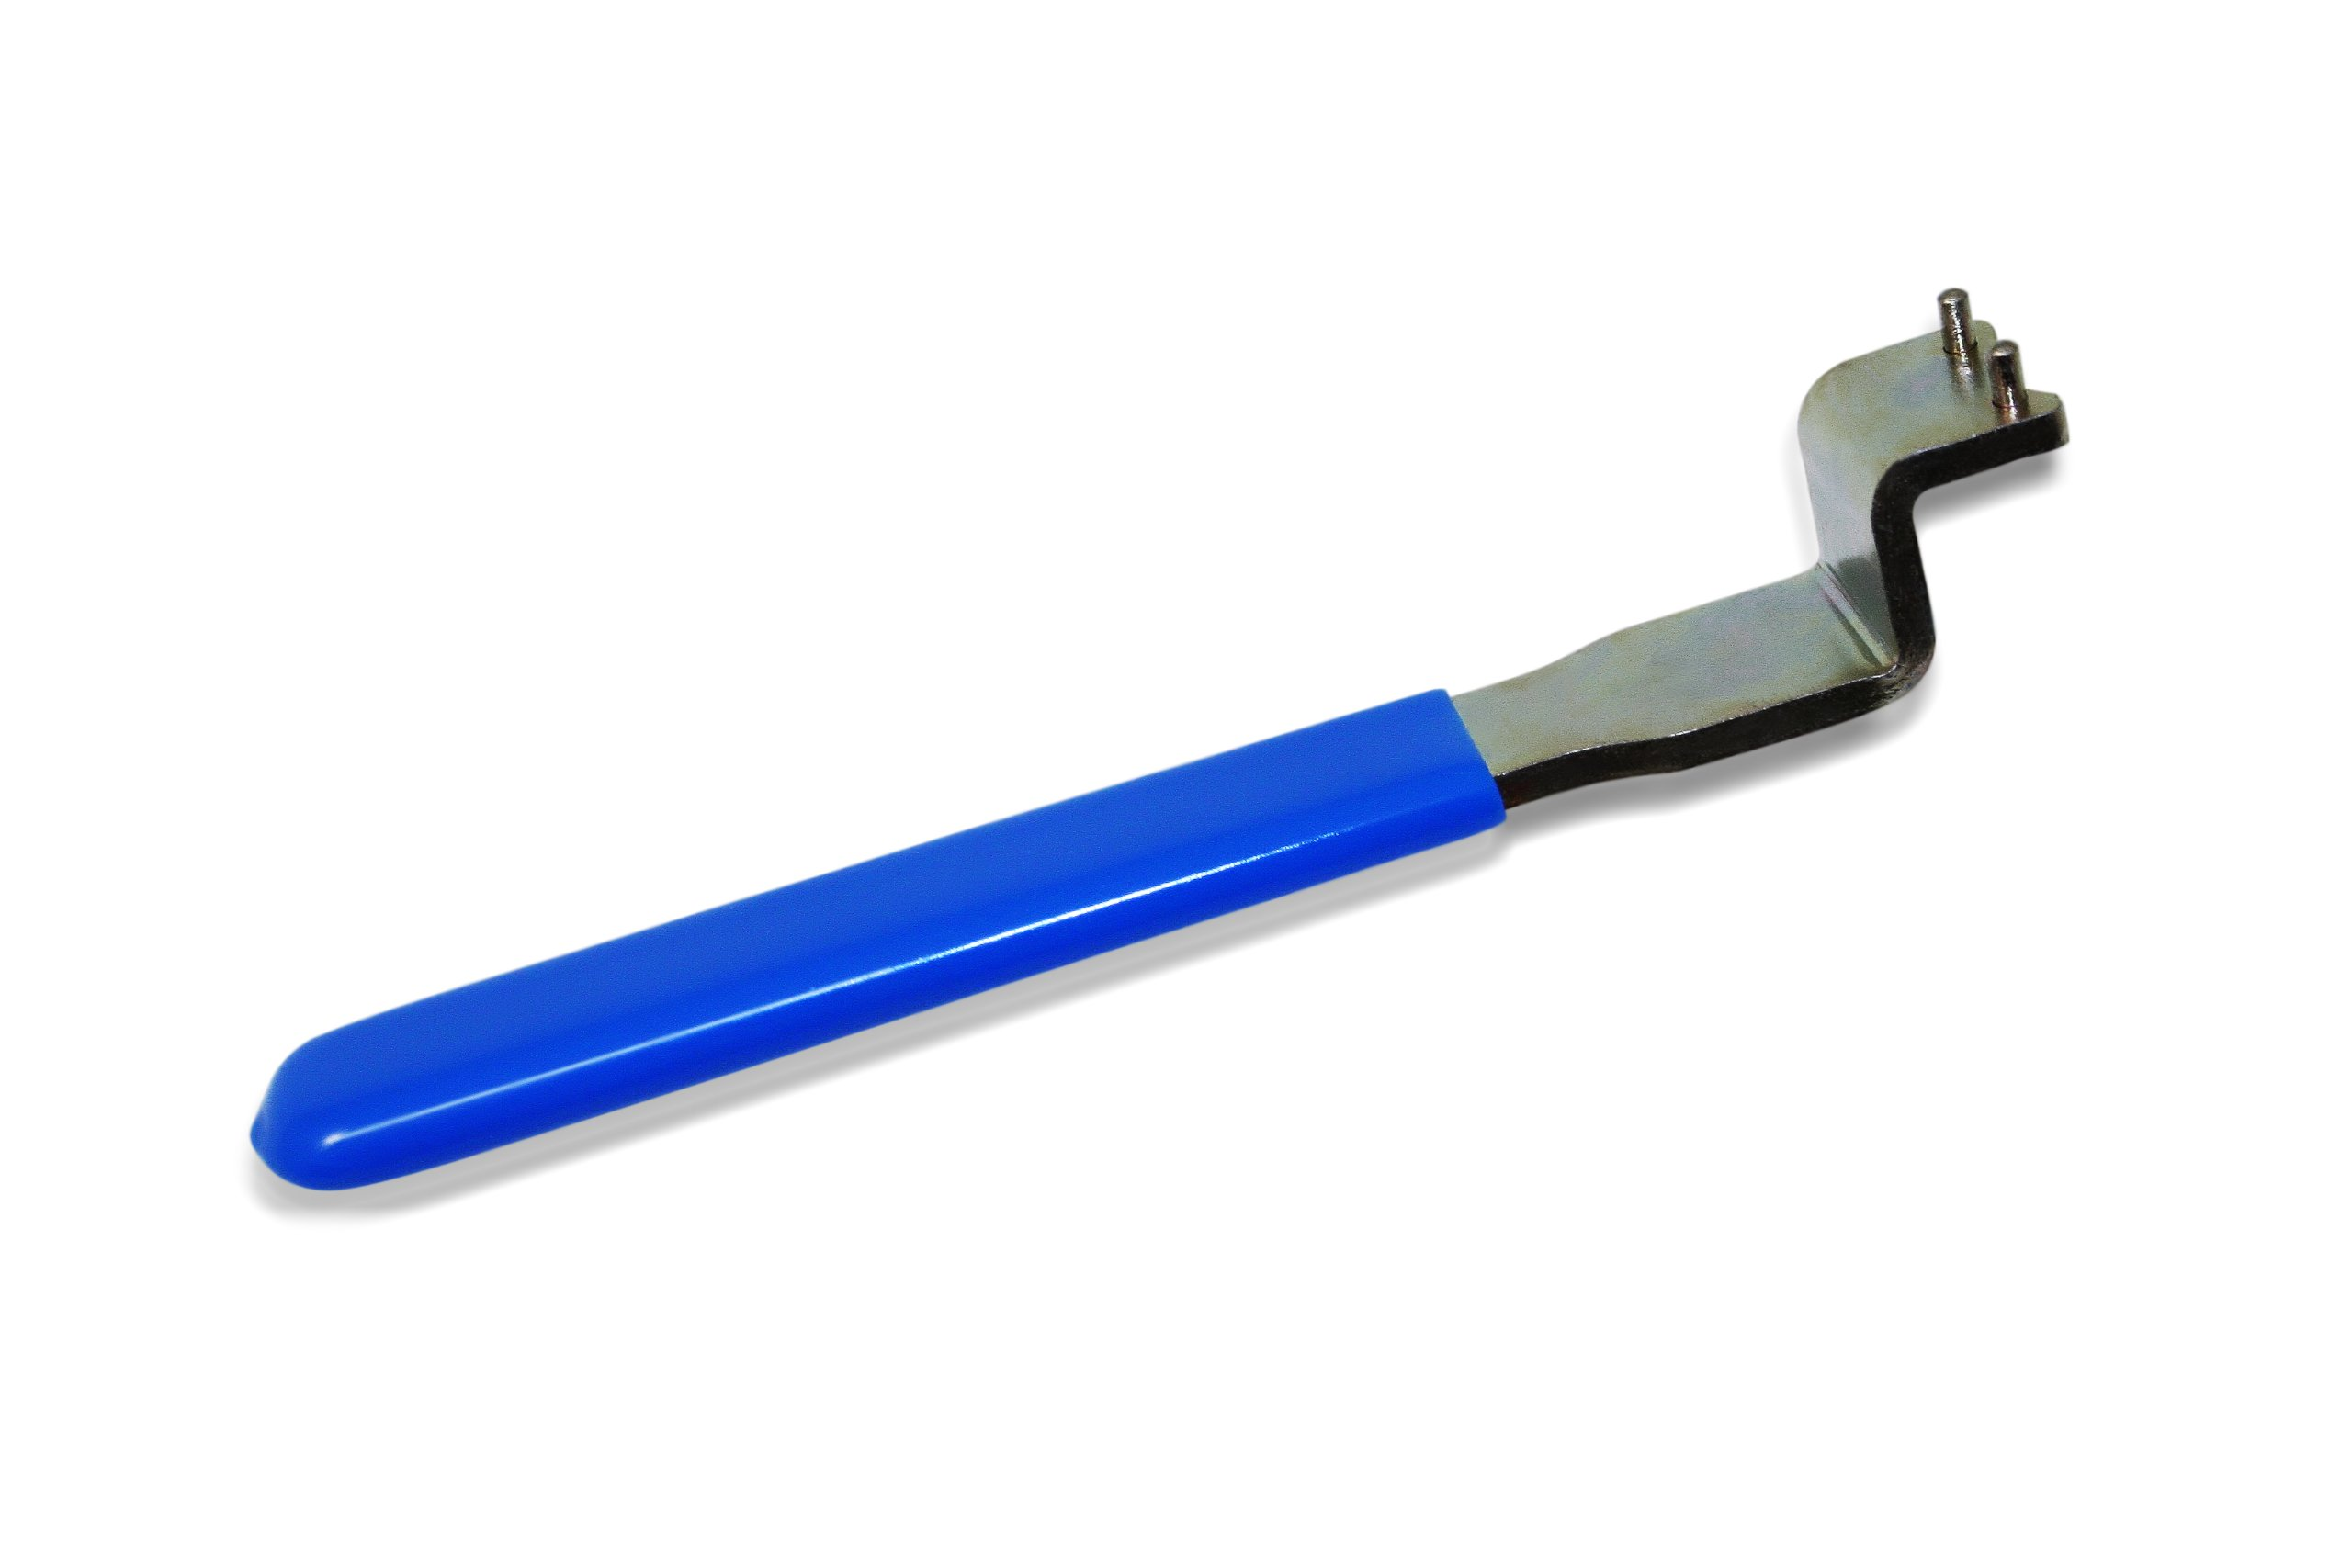 CTA Tools 2715 Tension Pulley Spanner - Compatible with Mitsubishi/Hyundai/Chrysler